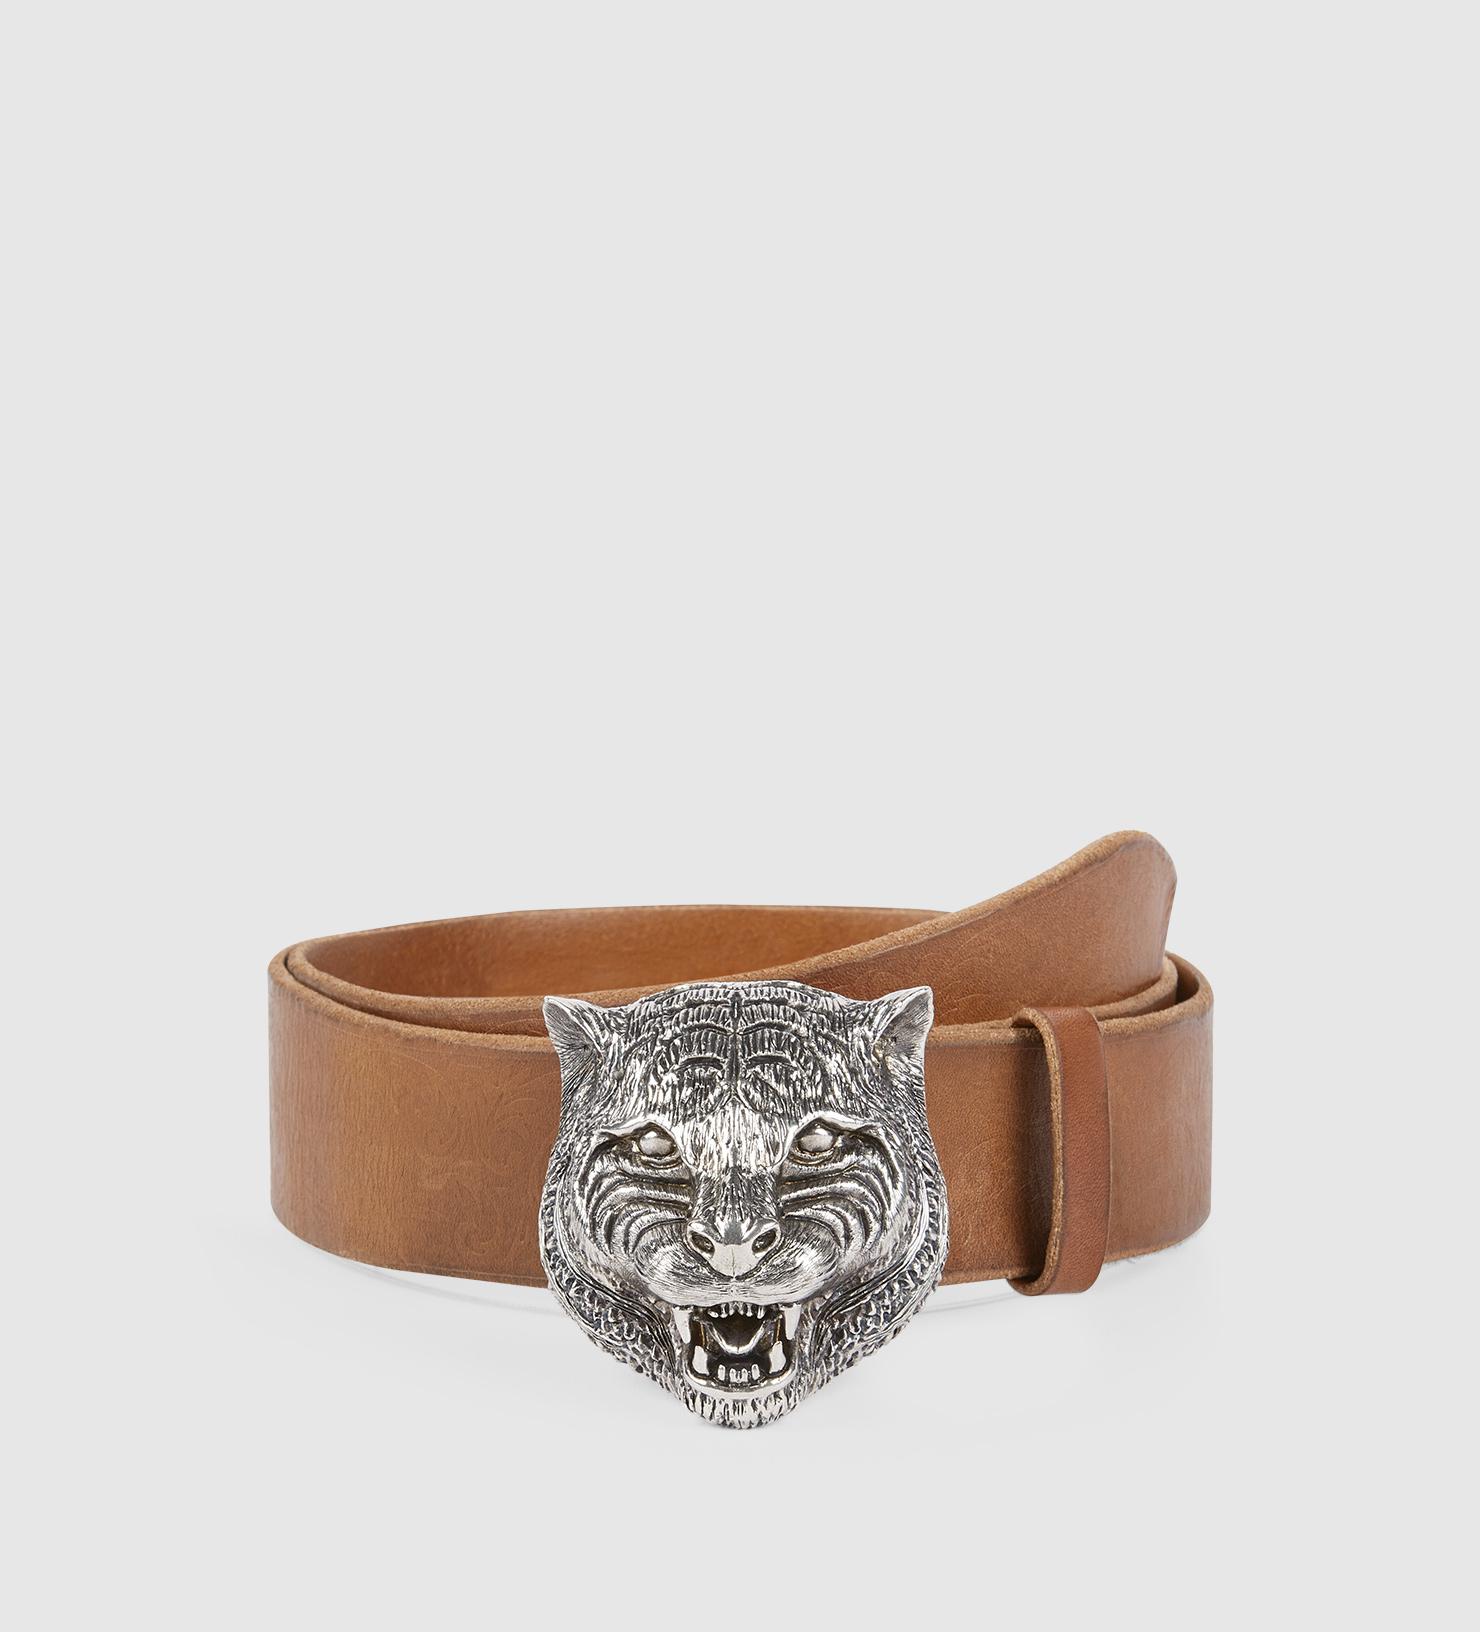 b34595de6c6 Lyst - Gucci Embossed Belt With Feline Buckle in Brown for Men